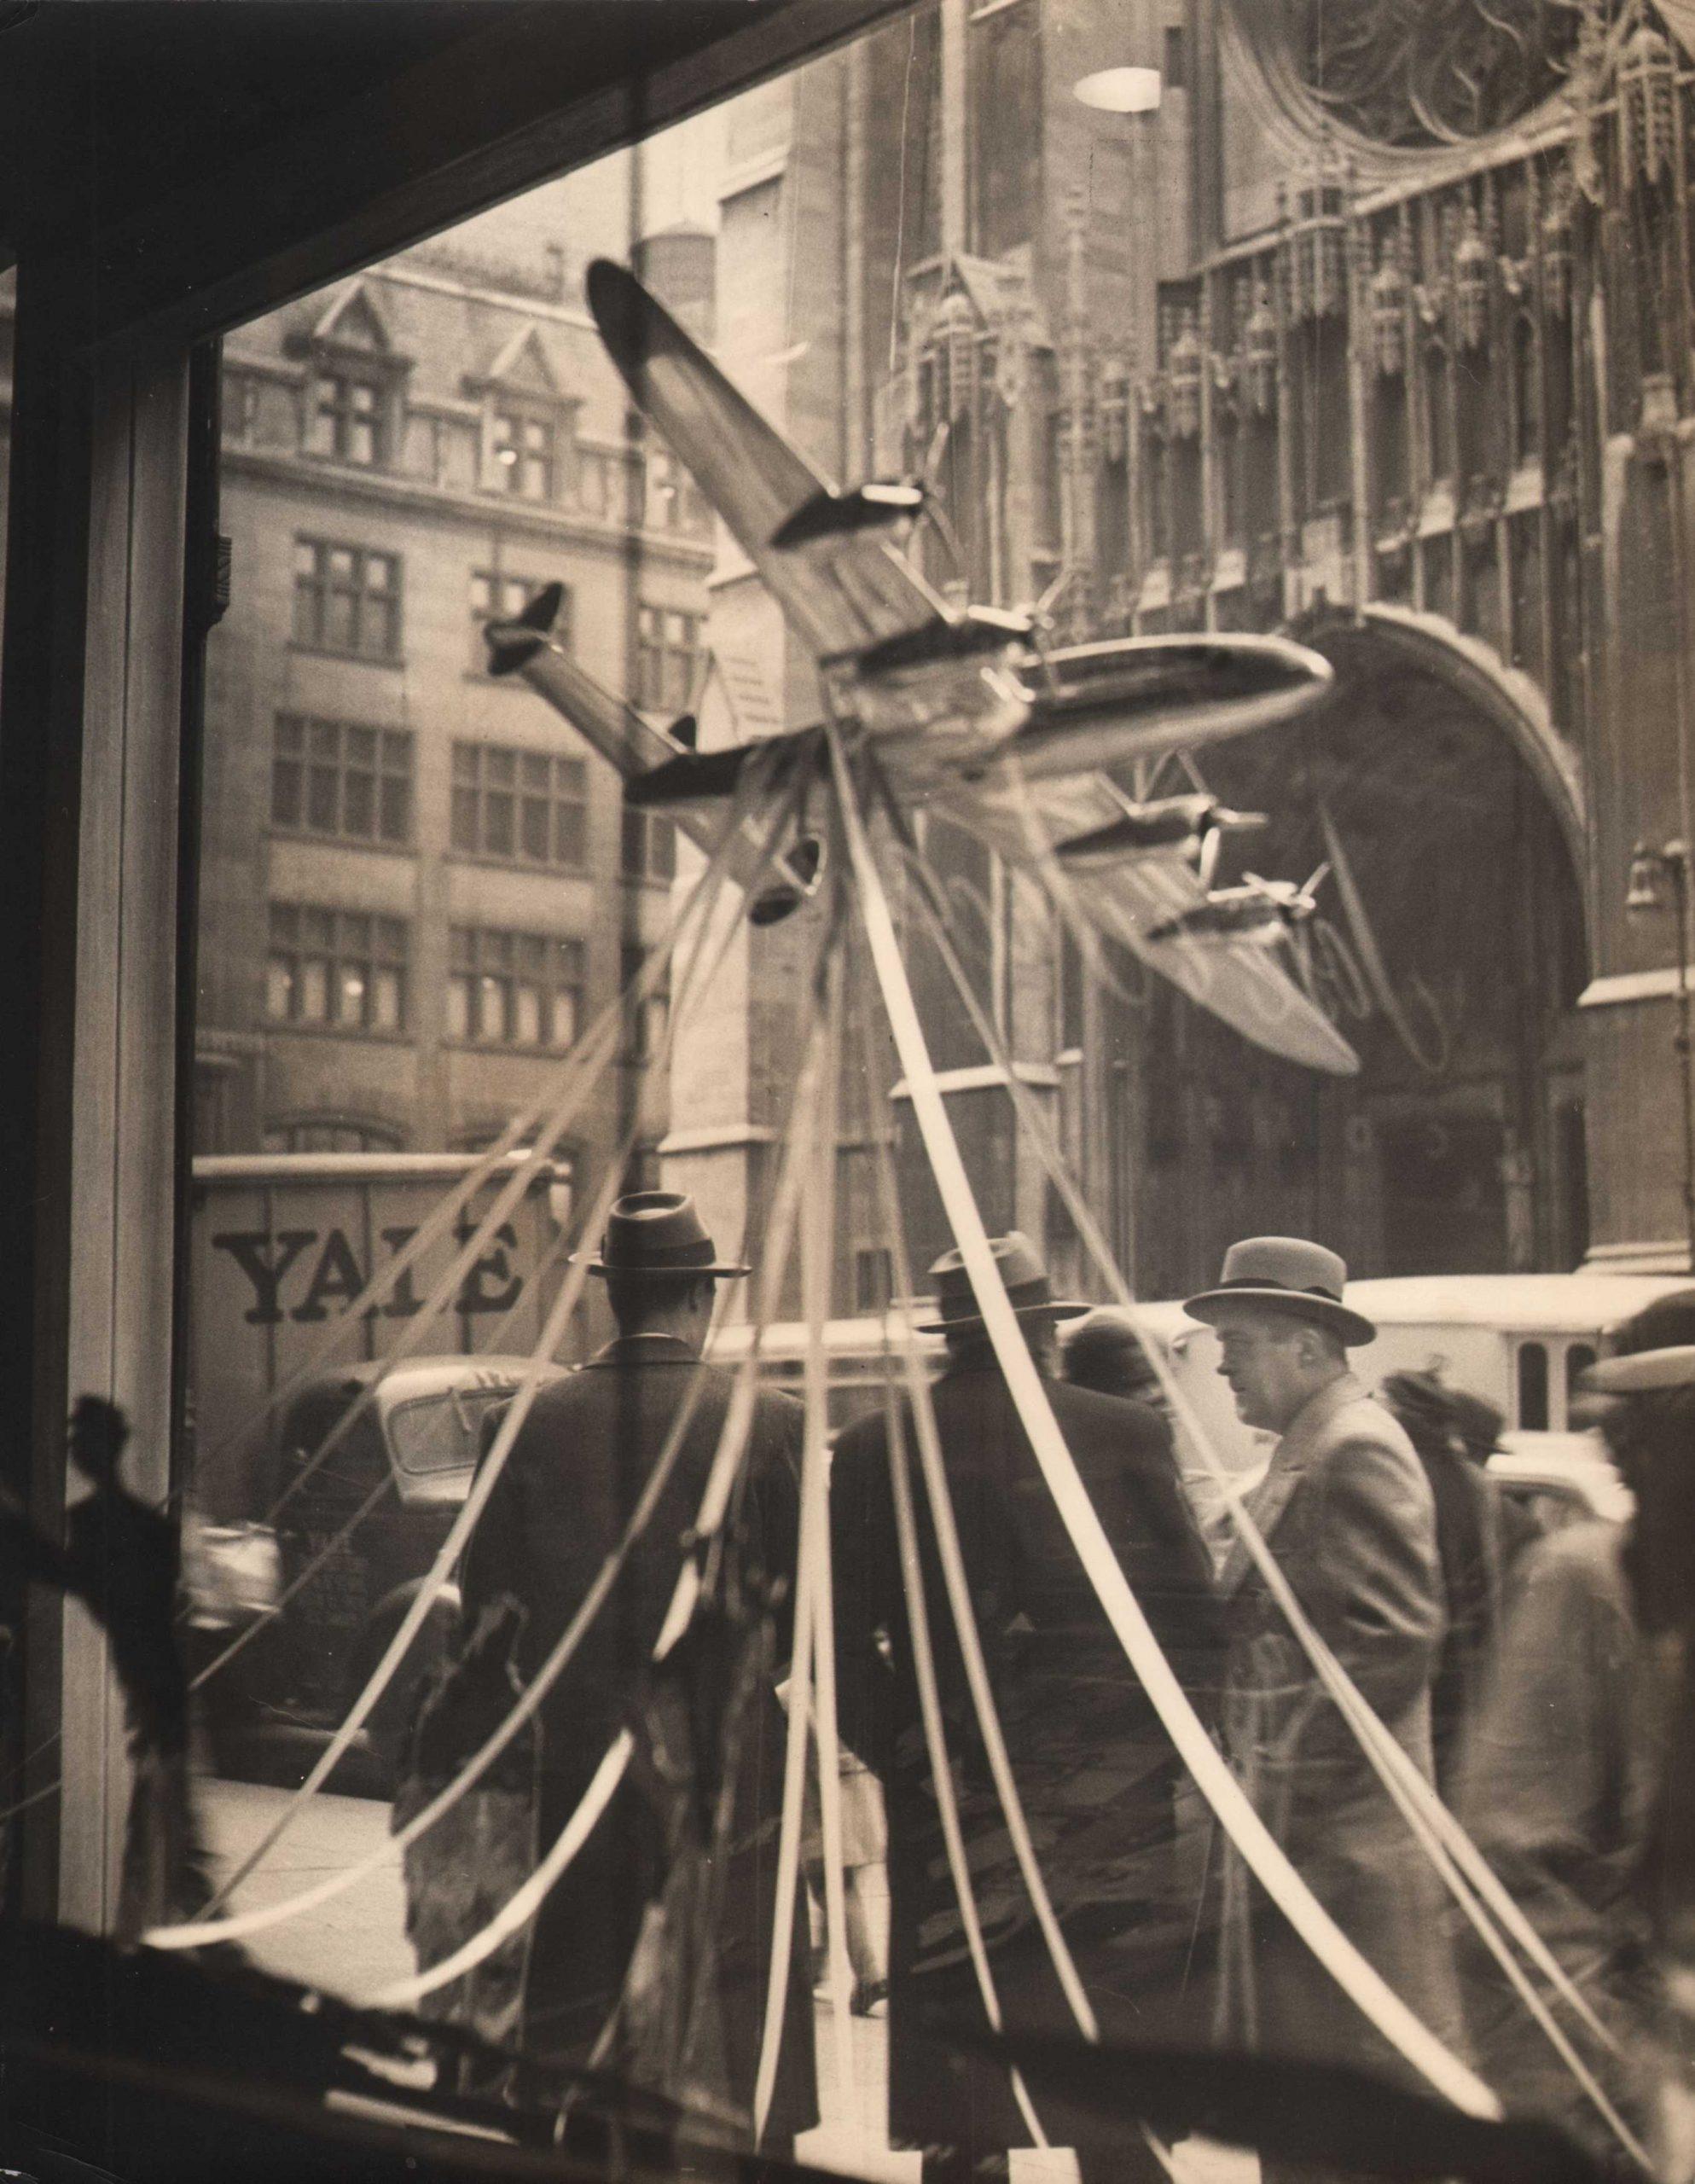 Simpson Kalisher, The shining airplane, c. 1948